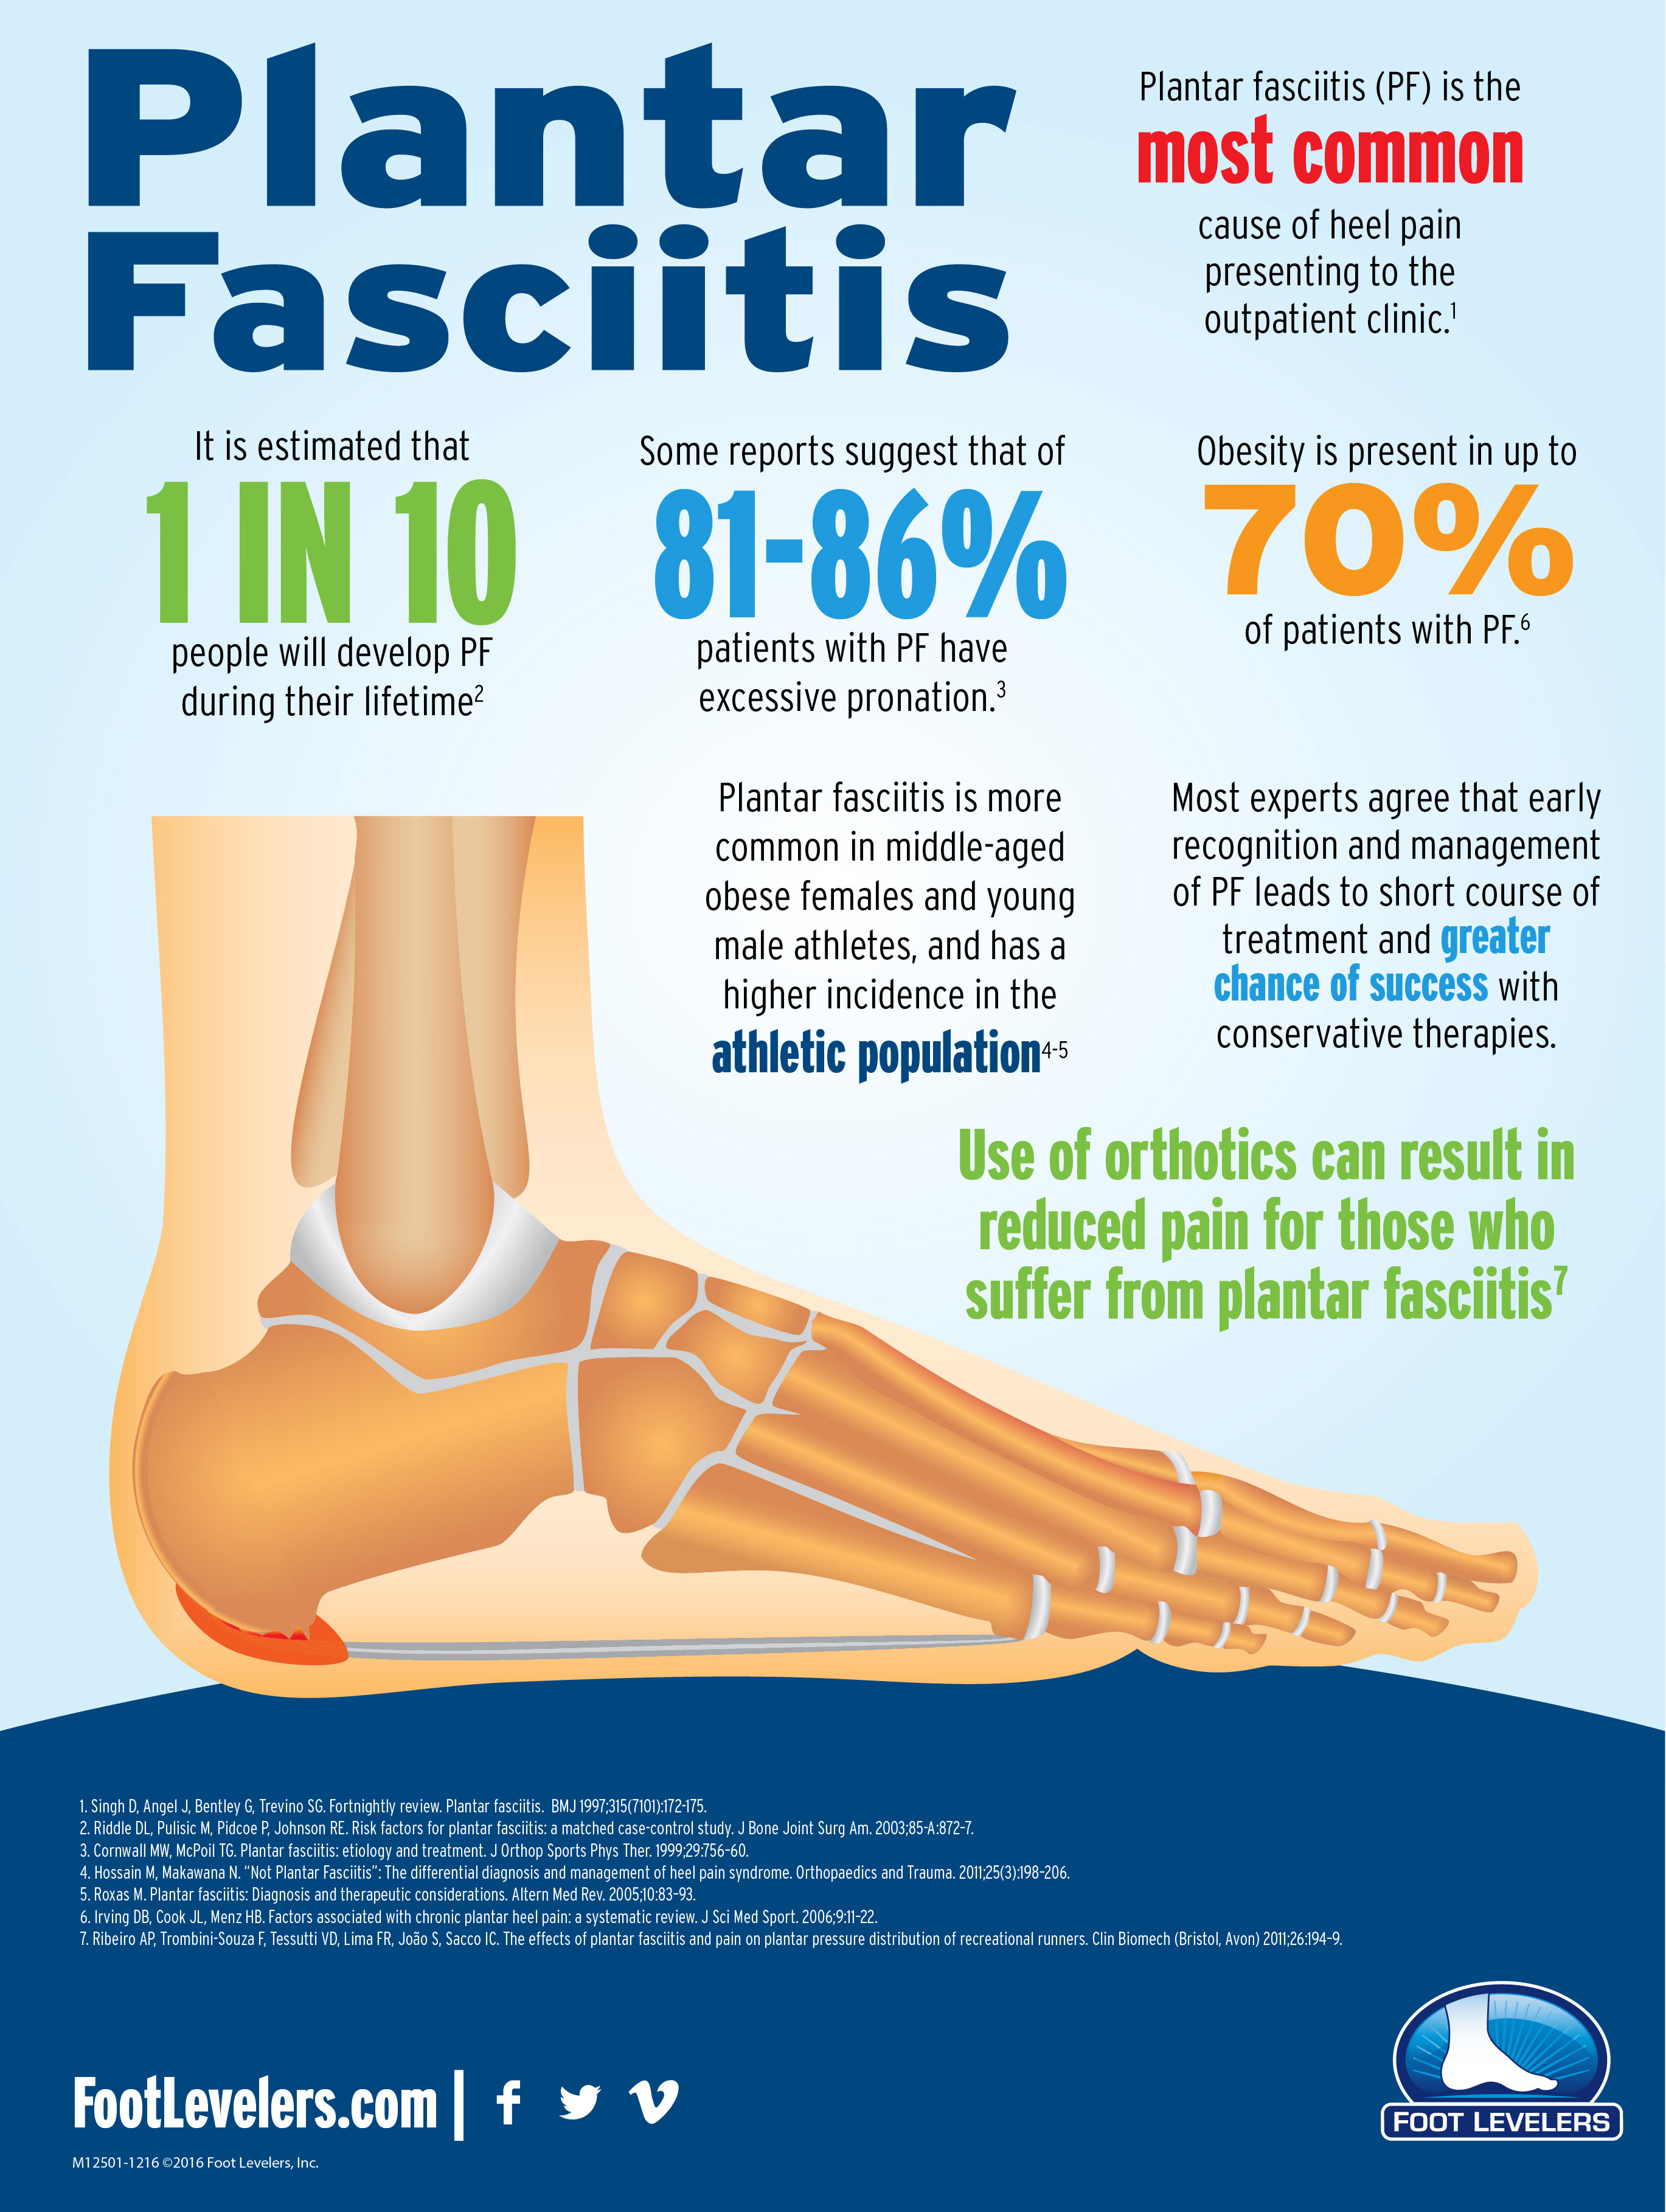 About Plantar Fasciitis